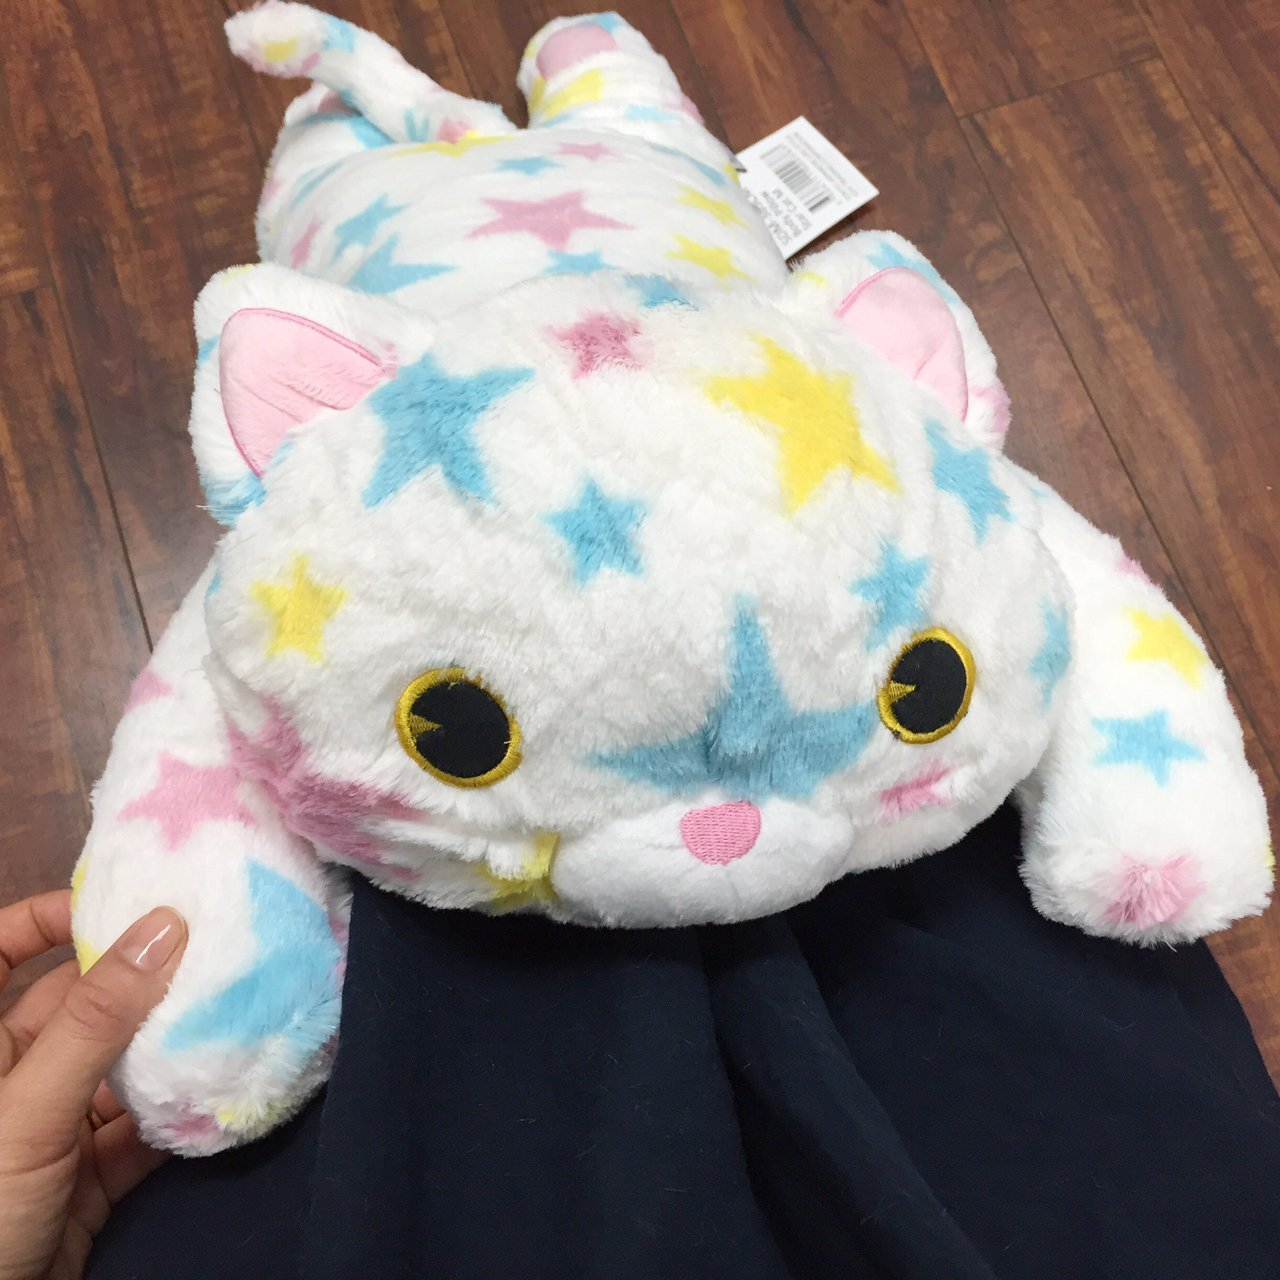 Tokyo Japanese Gift - Long Body Pillow - Animla Pillow - Hugging Pillow (Super Star Cat)